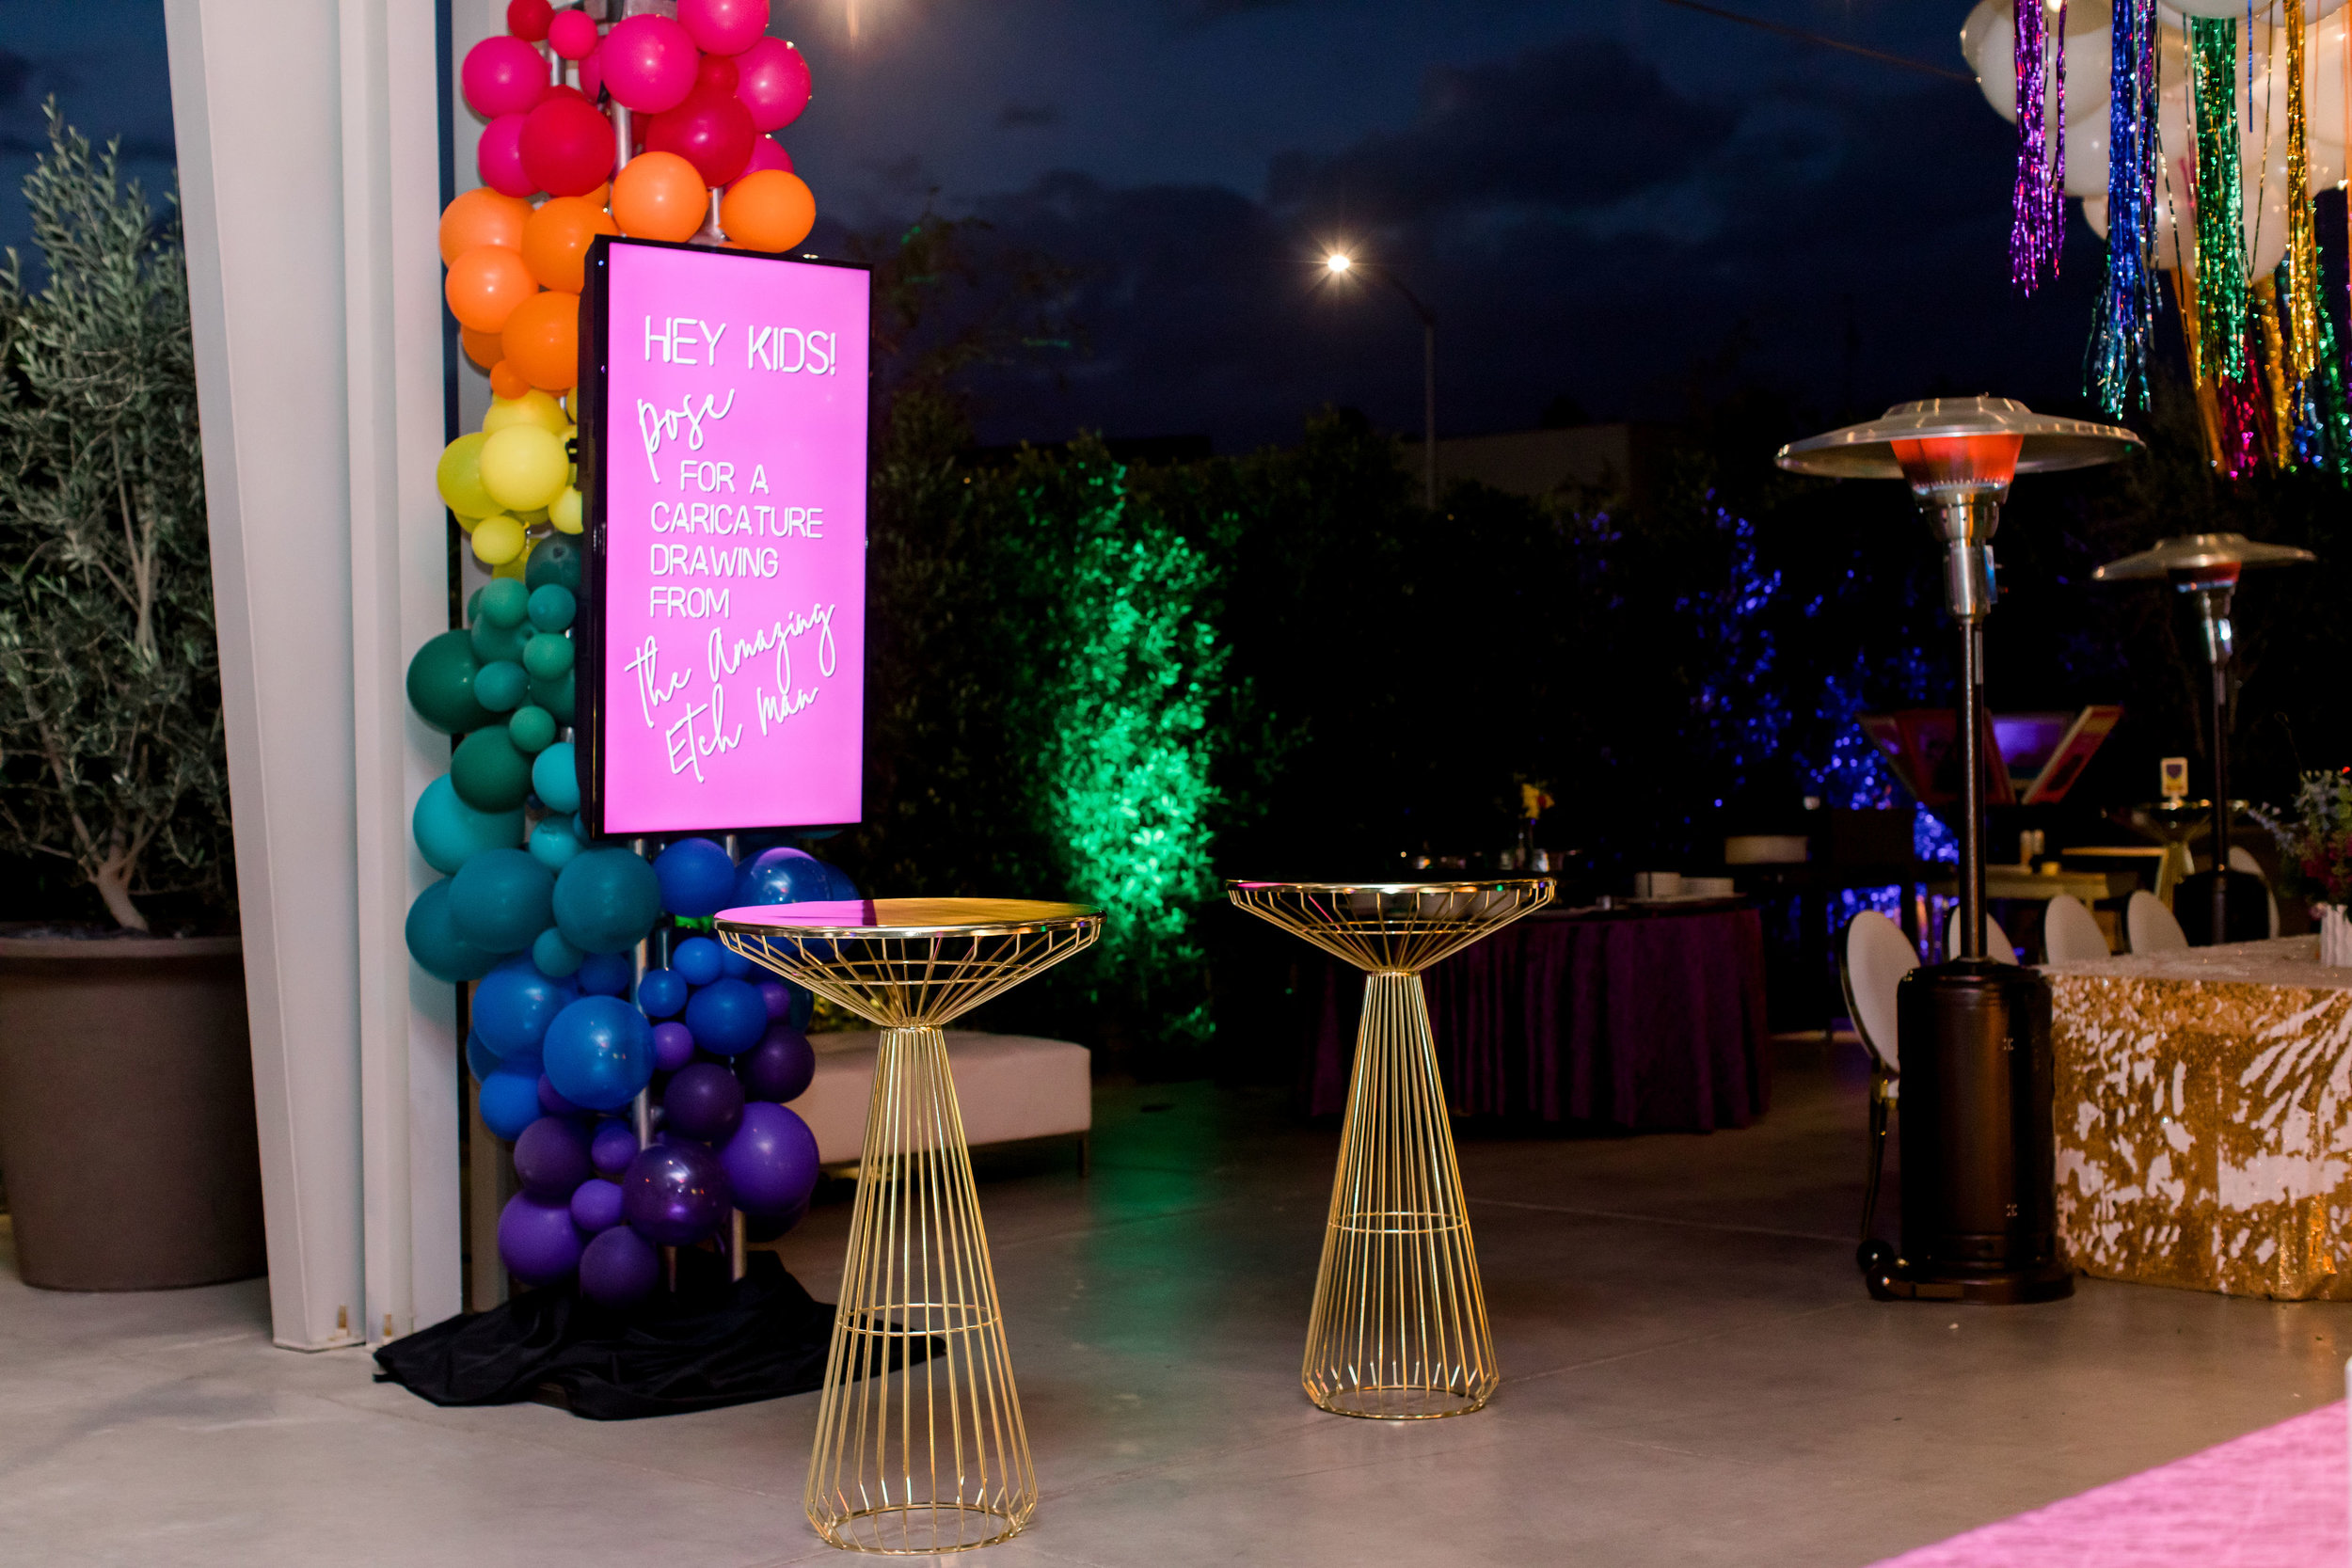 50 rainbow balloon column electronic party sign announcements rainbow bat mitzvah gold mermaid sequin linen Life Design Events photos by Stephanie Heymann Photography.jpg